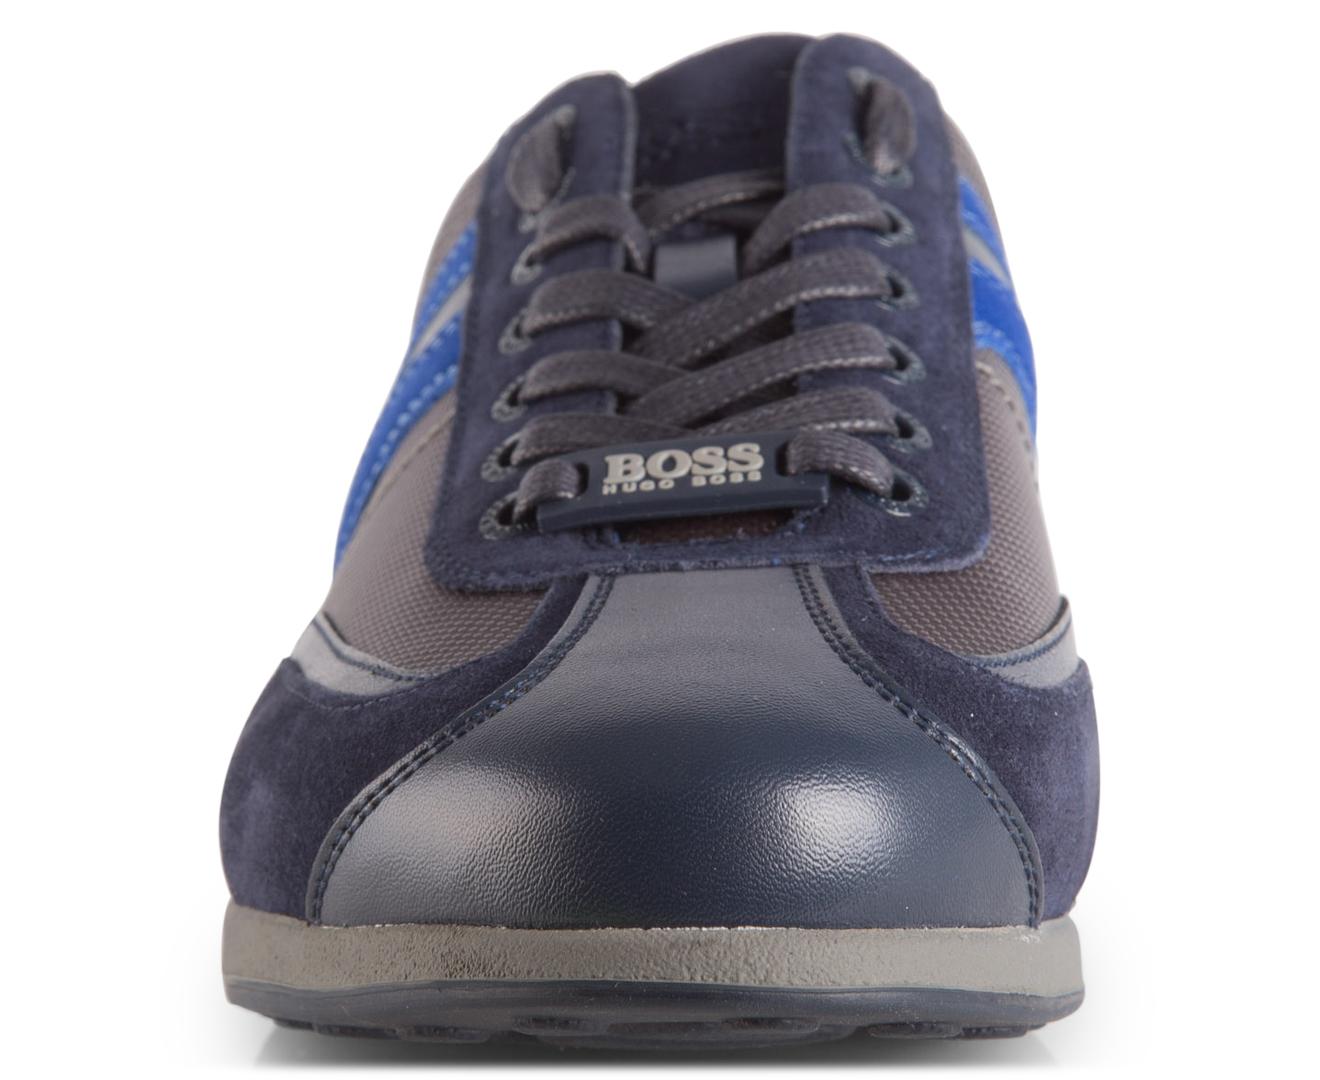 hugo boss sport shoes - photo #42